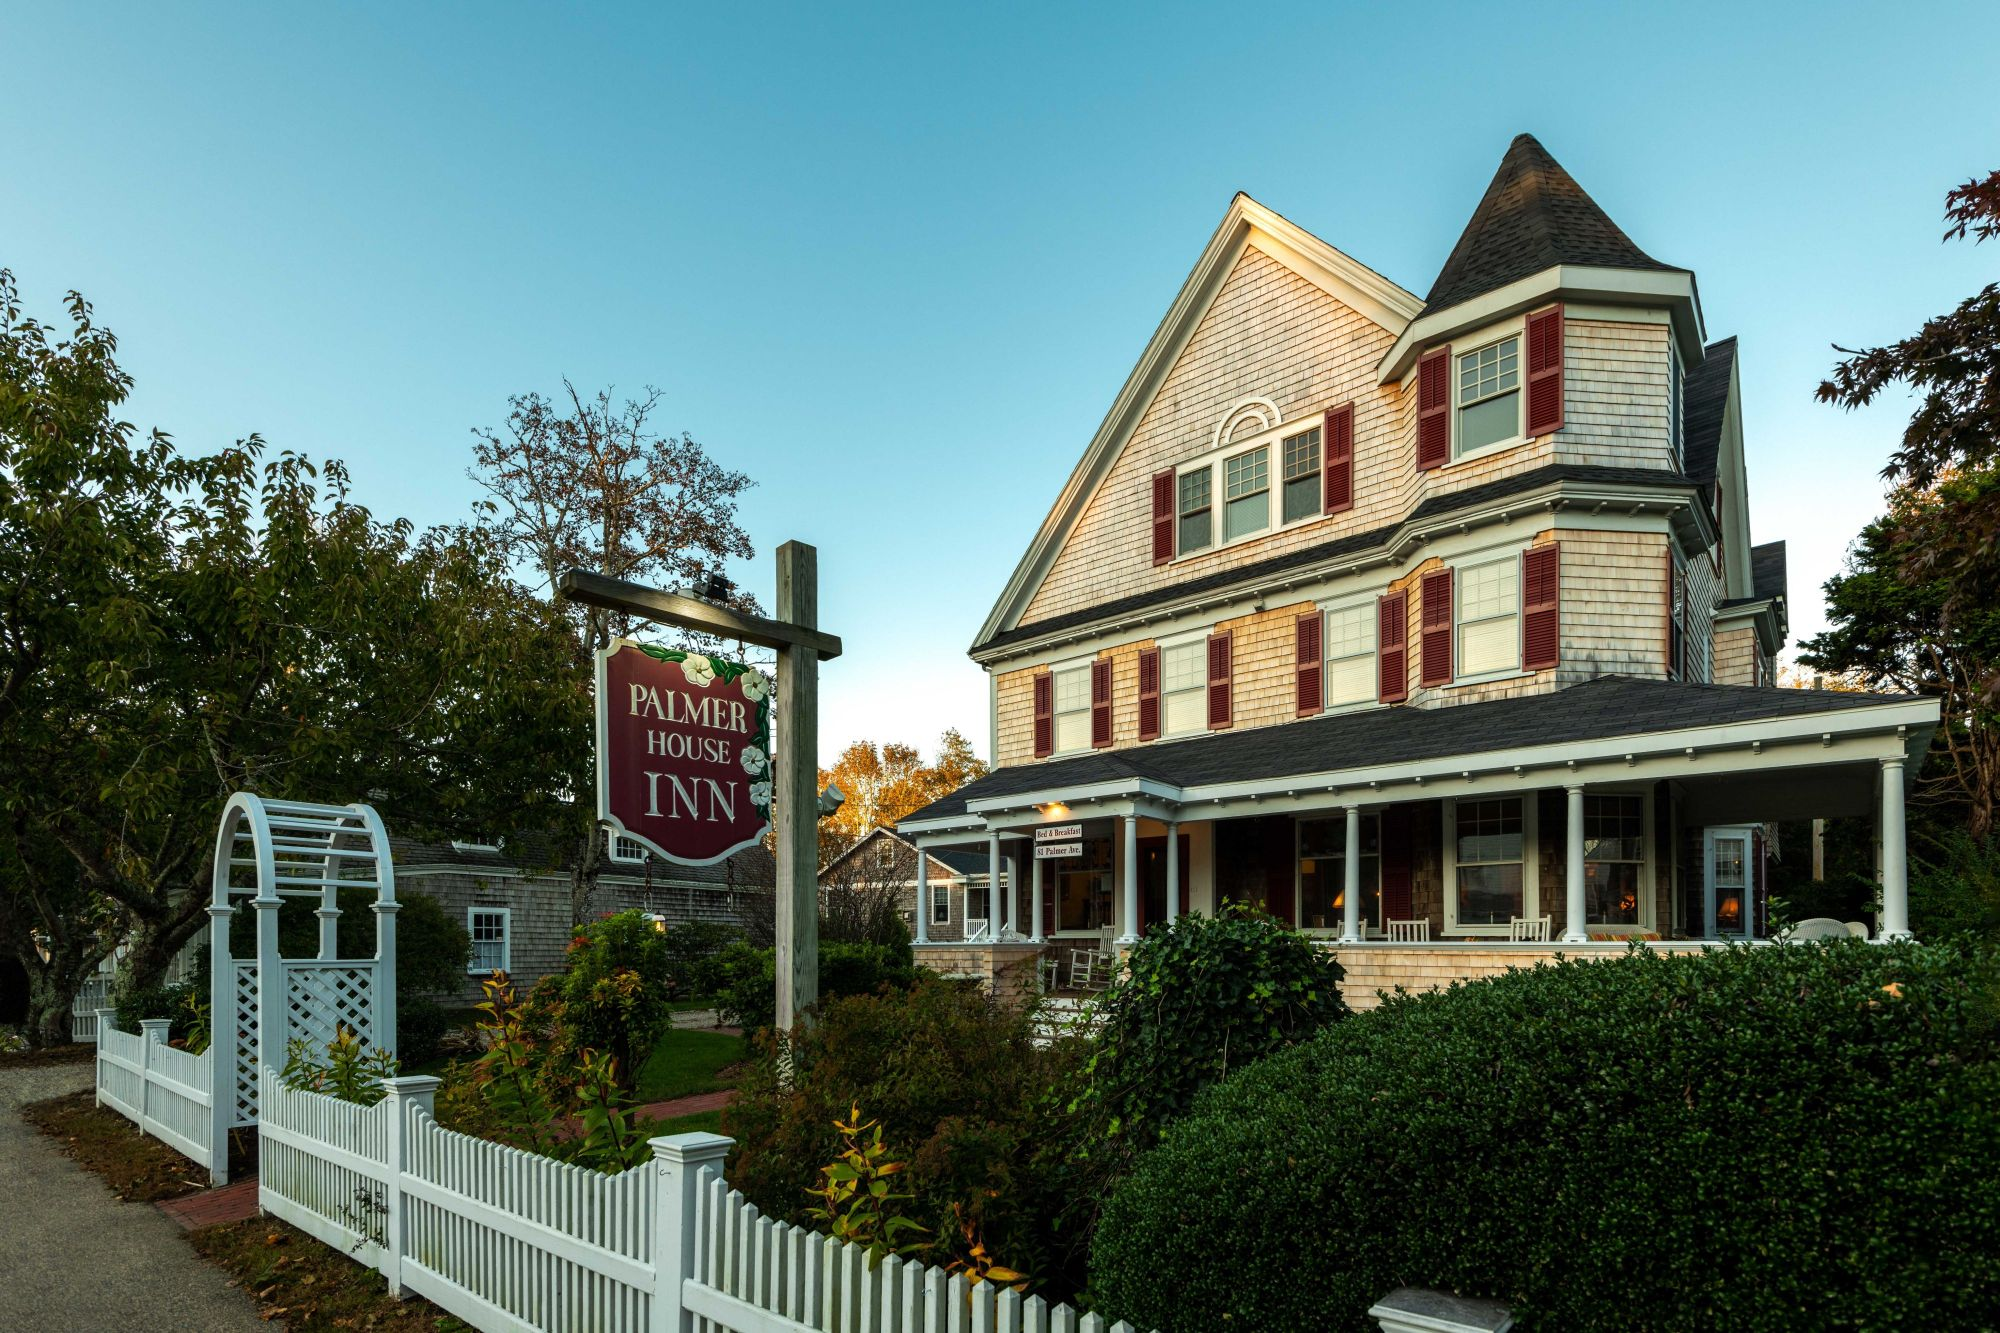 Palmer House Inn from road